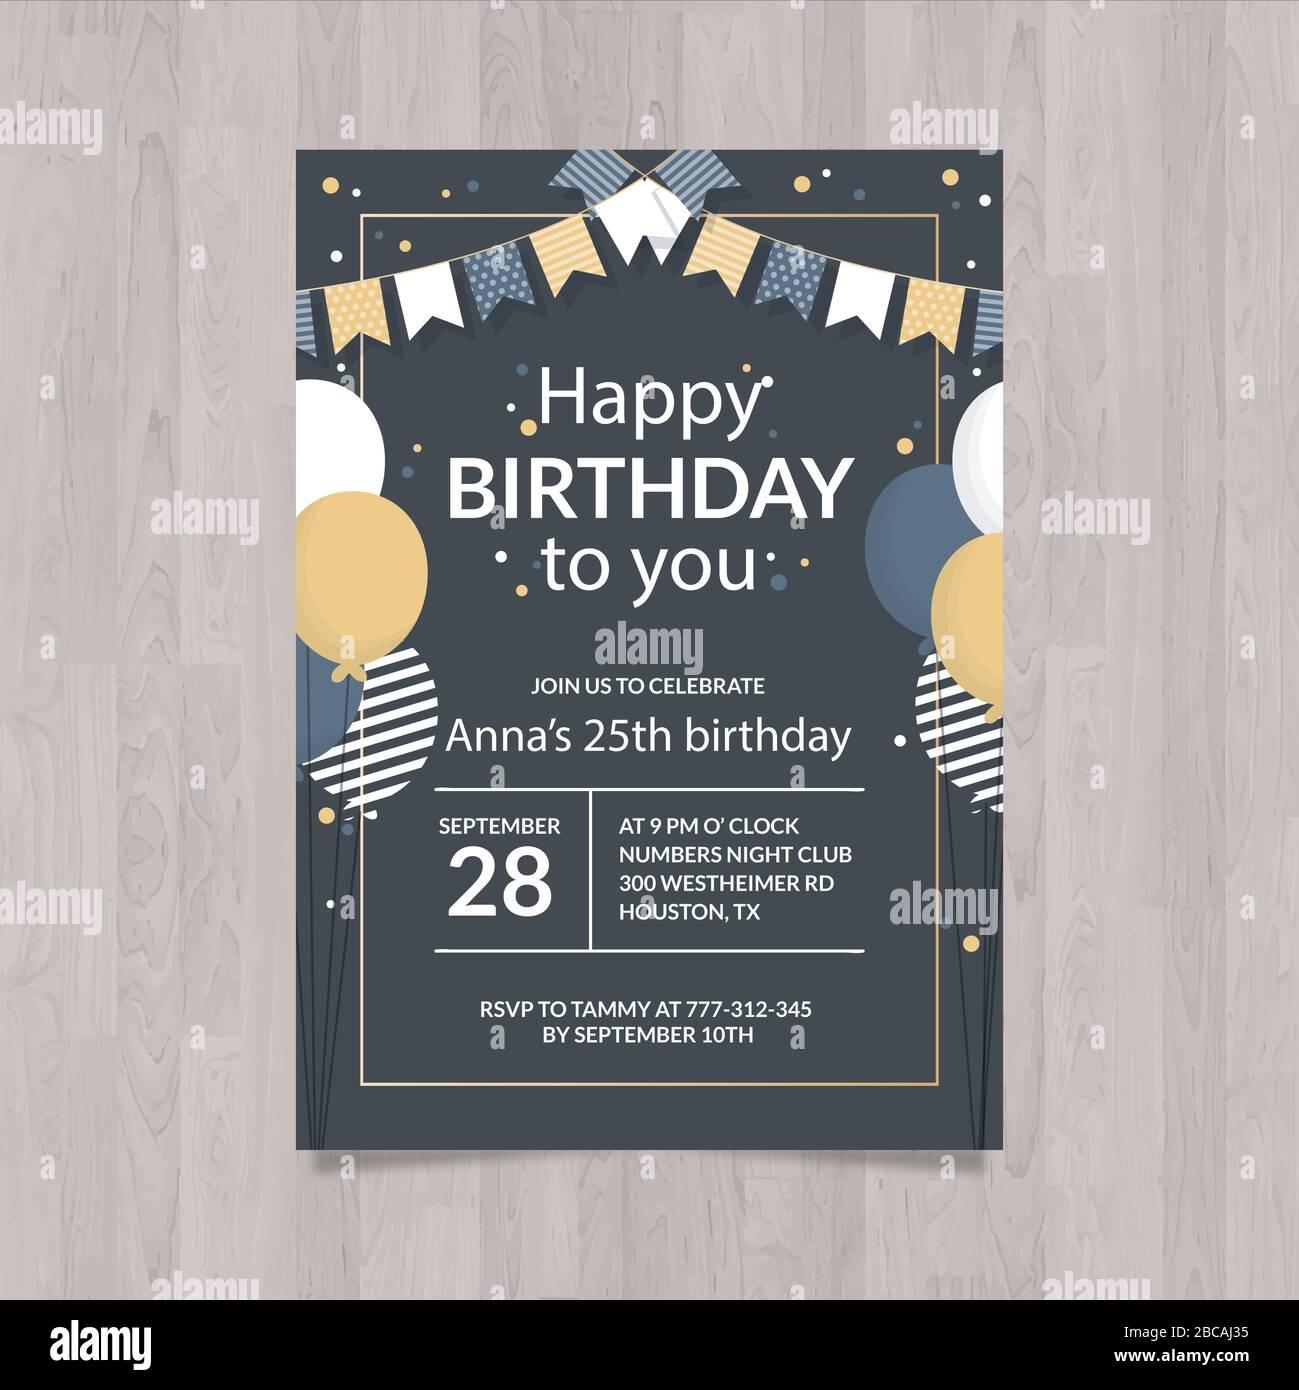 https www alamy com happy birthday invitation card template image351816953 html